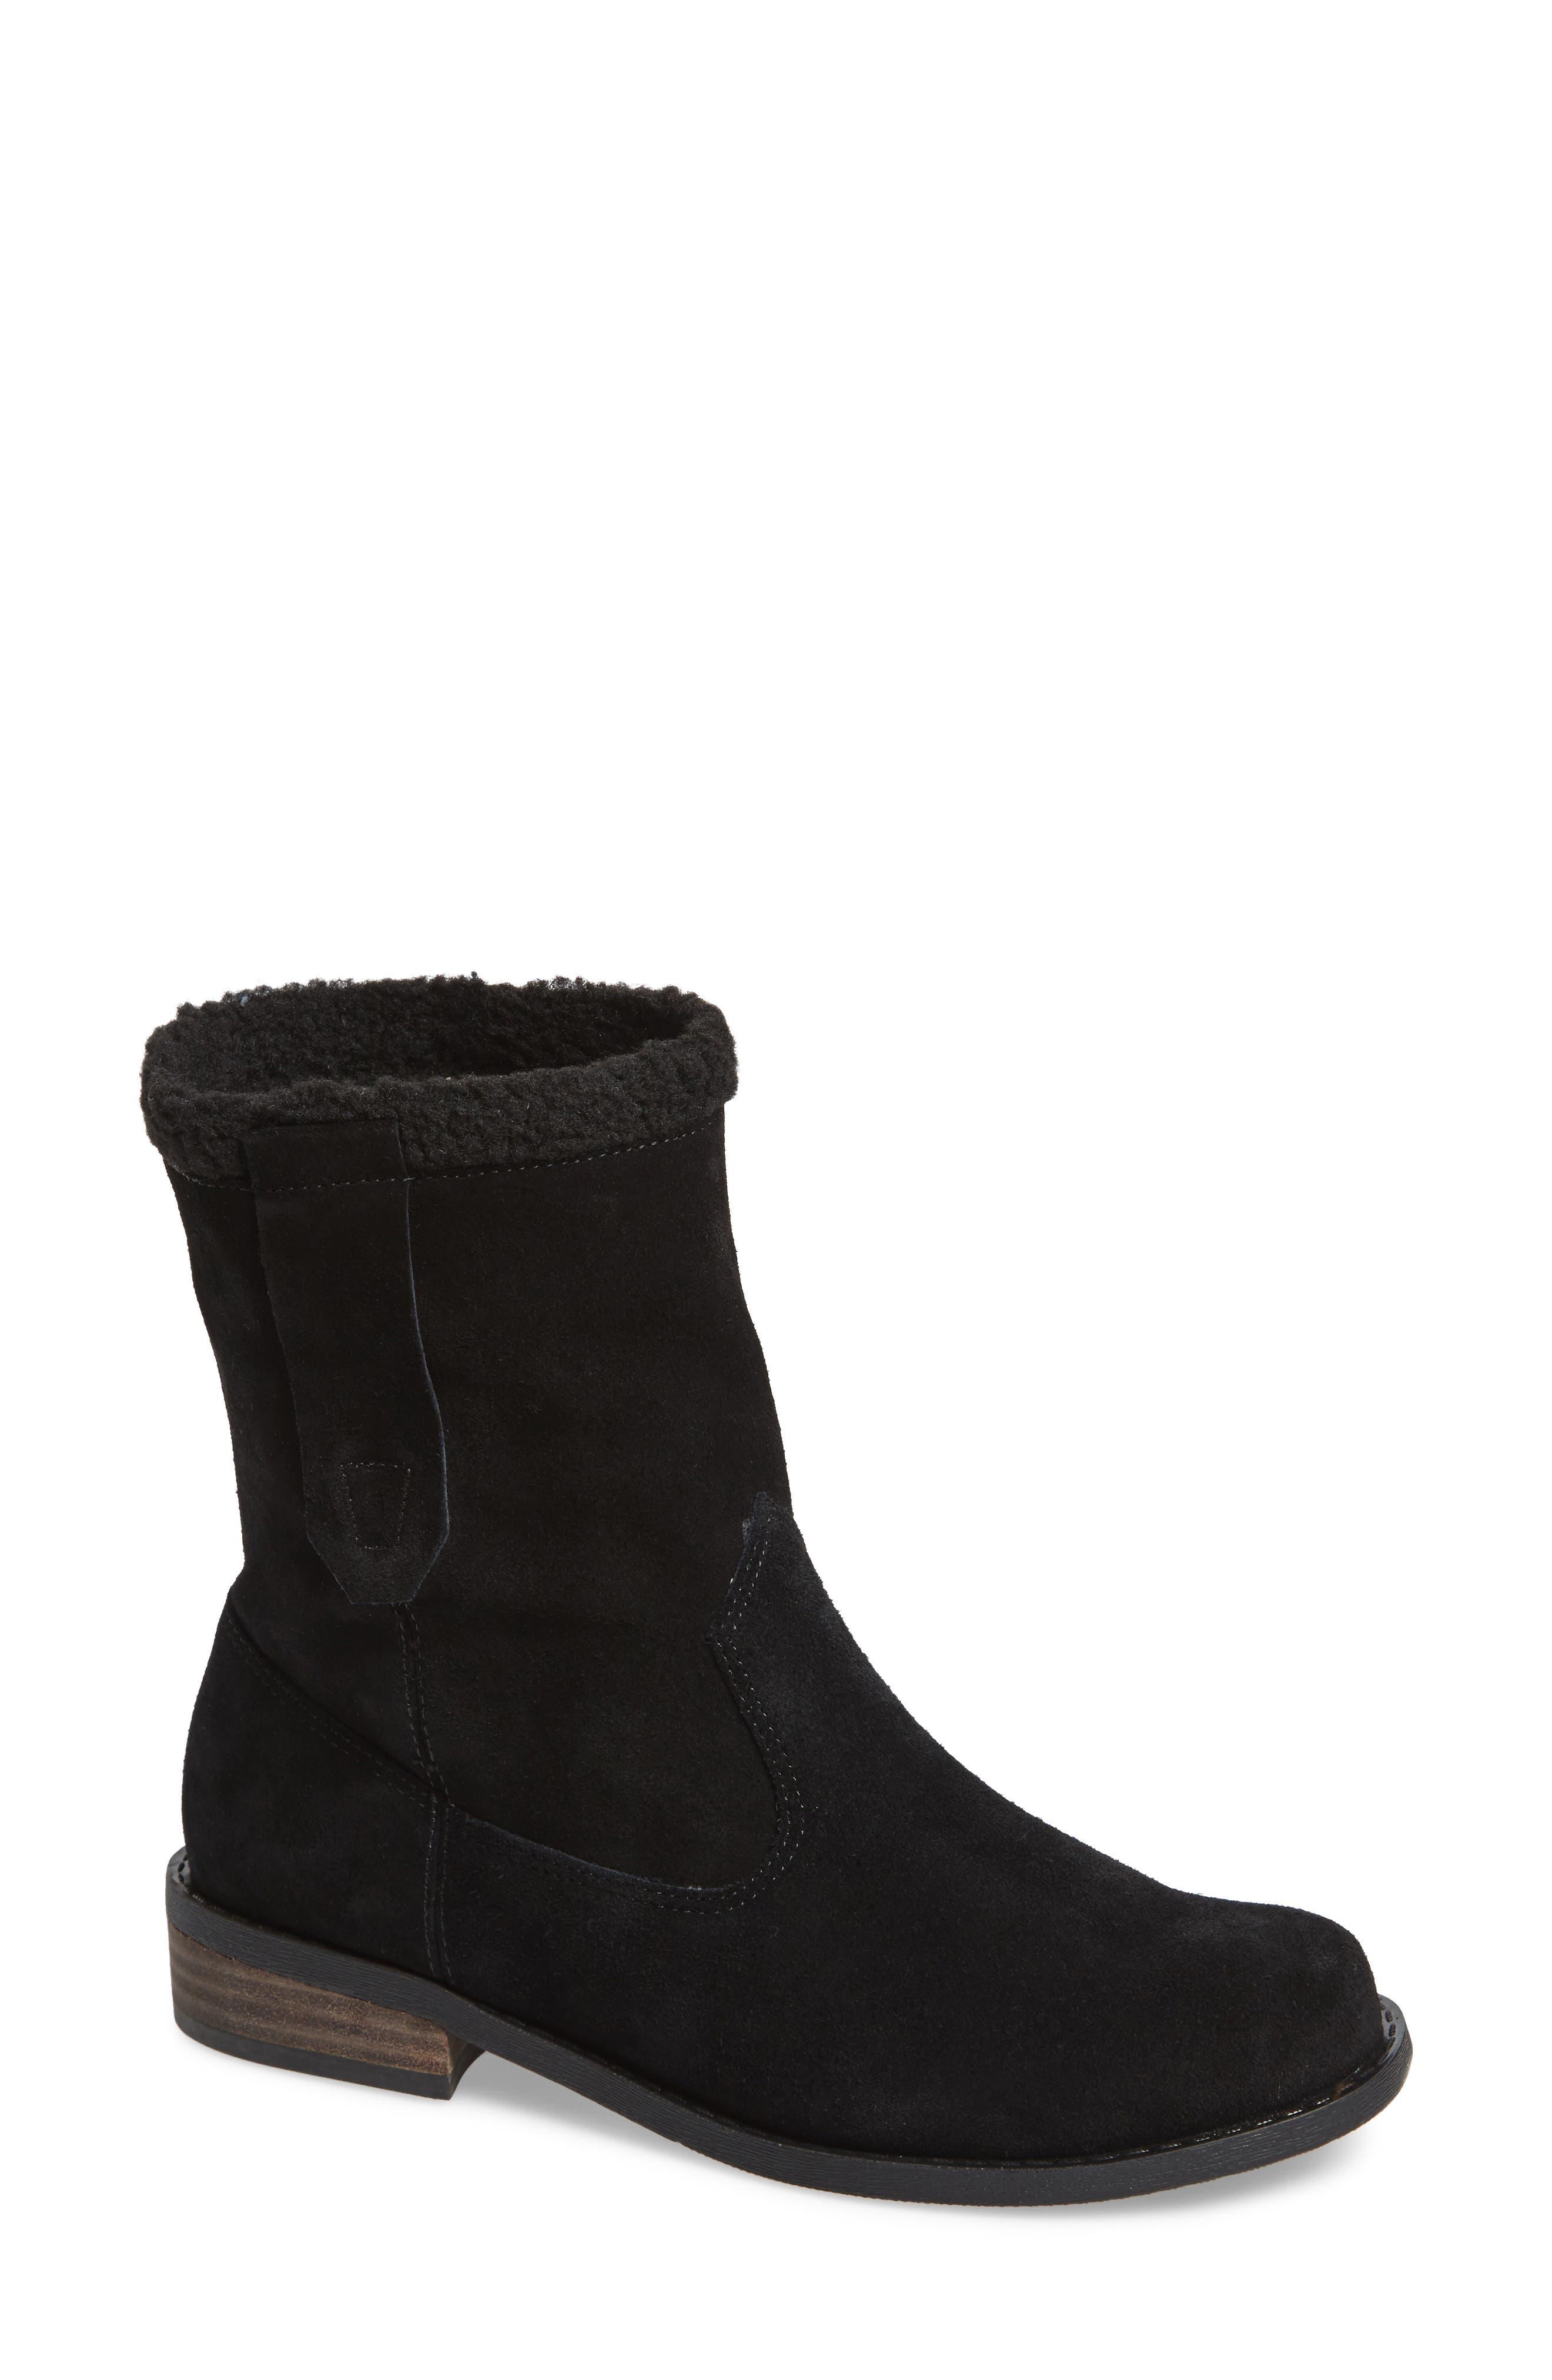 Verona Faux Shearling Boot,                         Main,                         color,